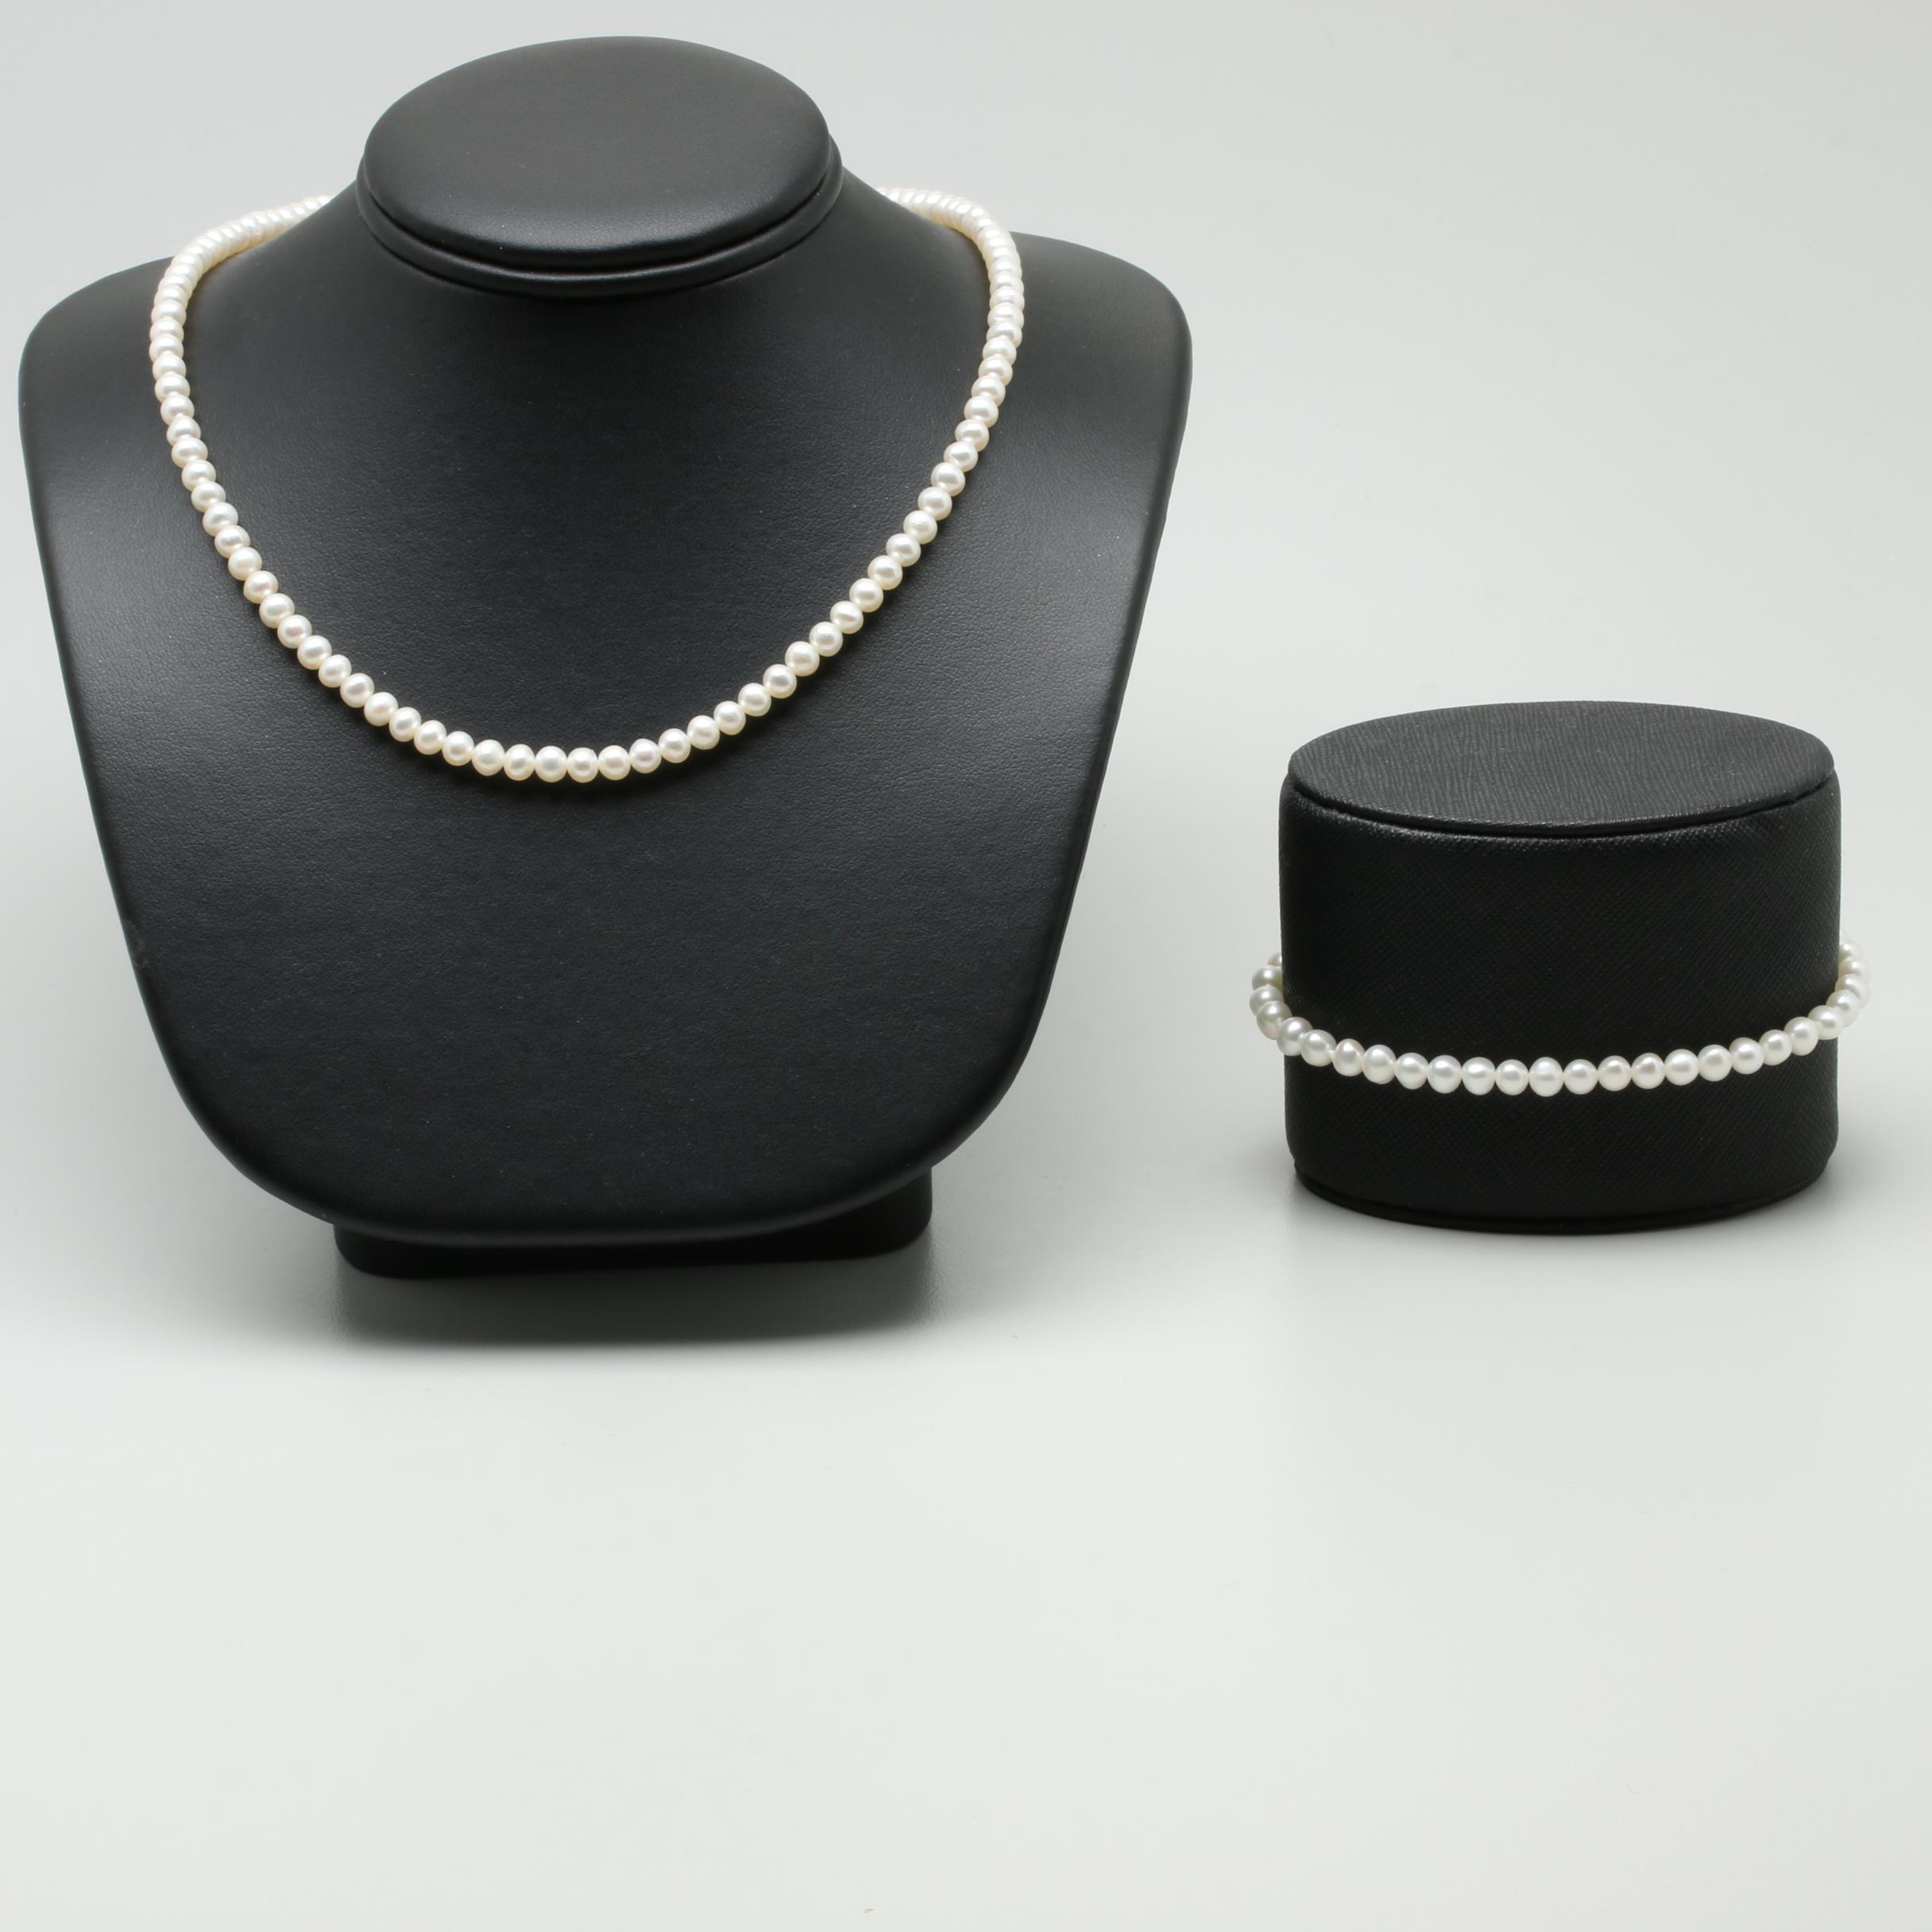 14K Yellow Gold Cultured Pearl Demi Parure